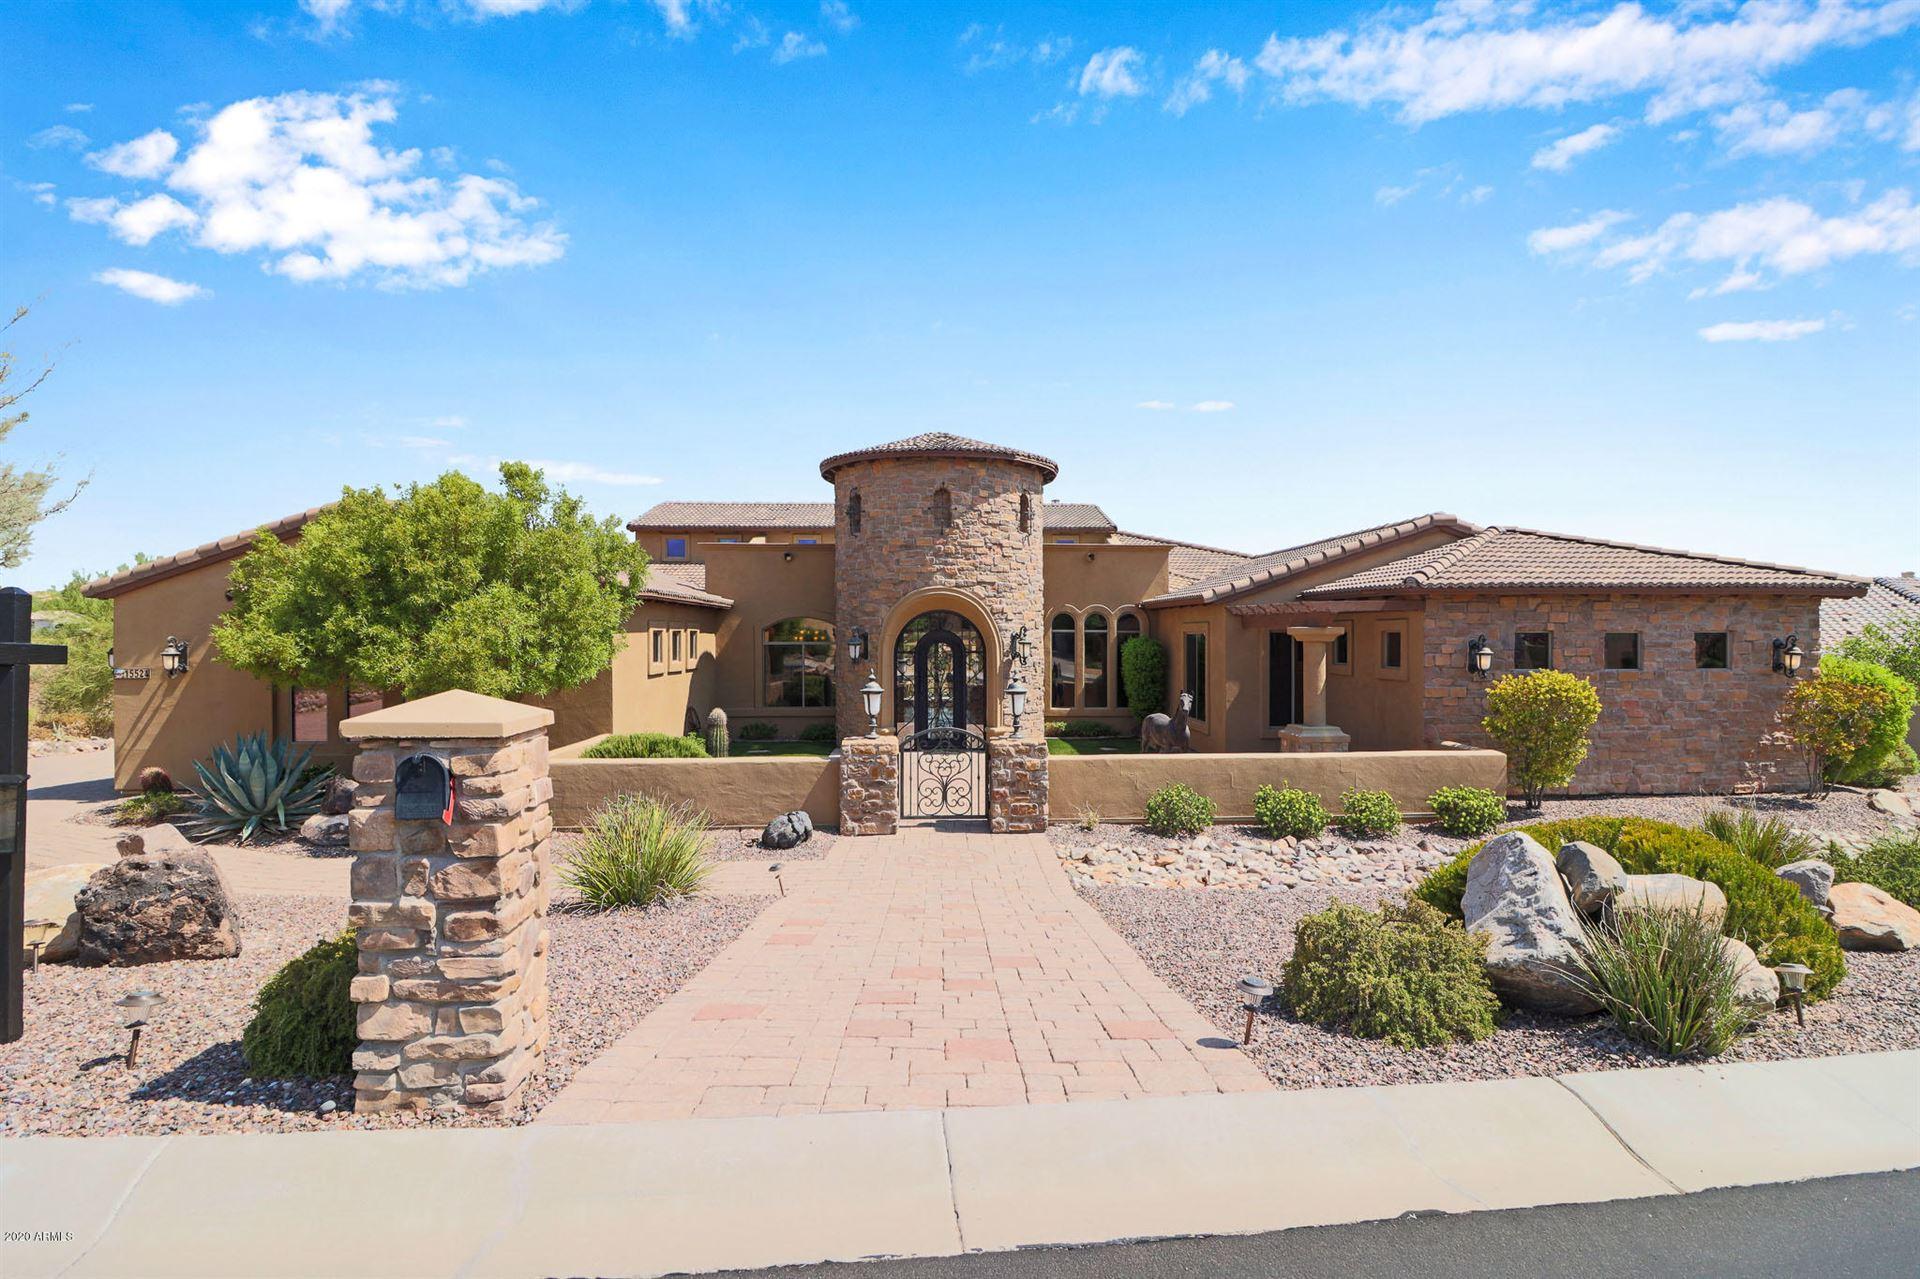 15524 E PALATIAL Drive, Fountain Hills, AZ 85268 - MLS#: 6127136